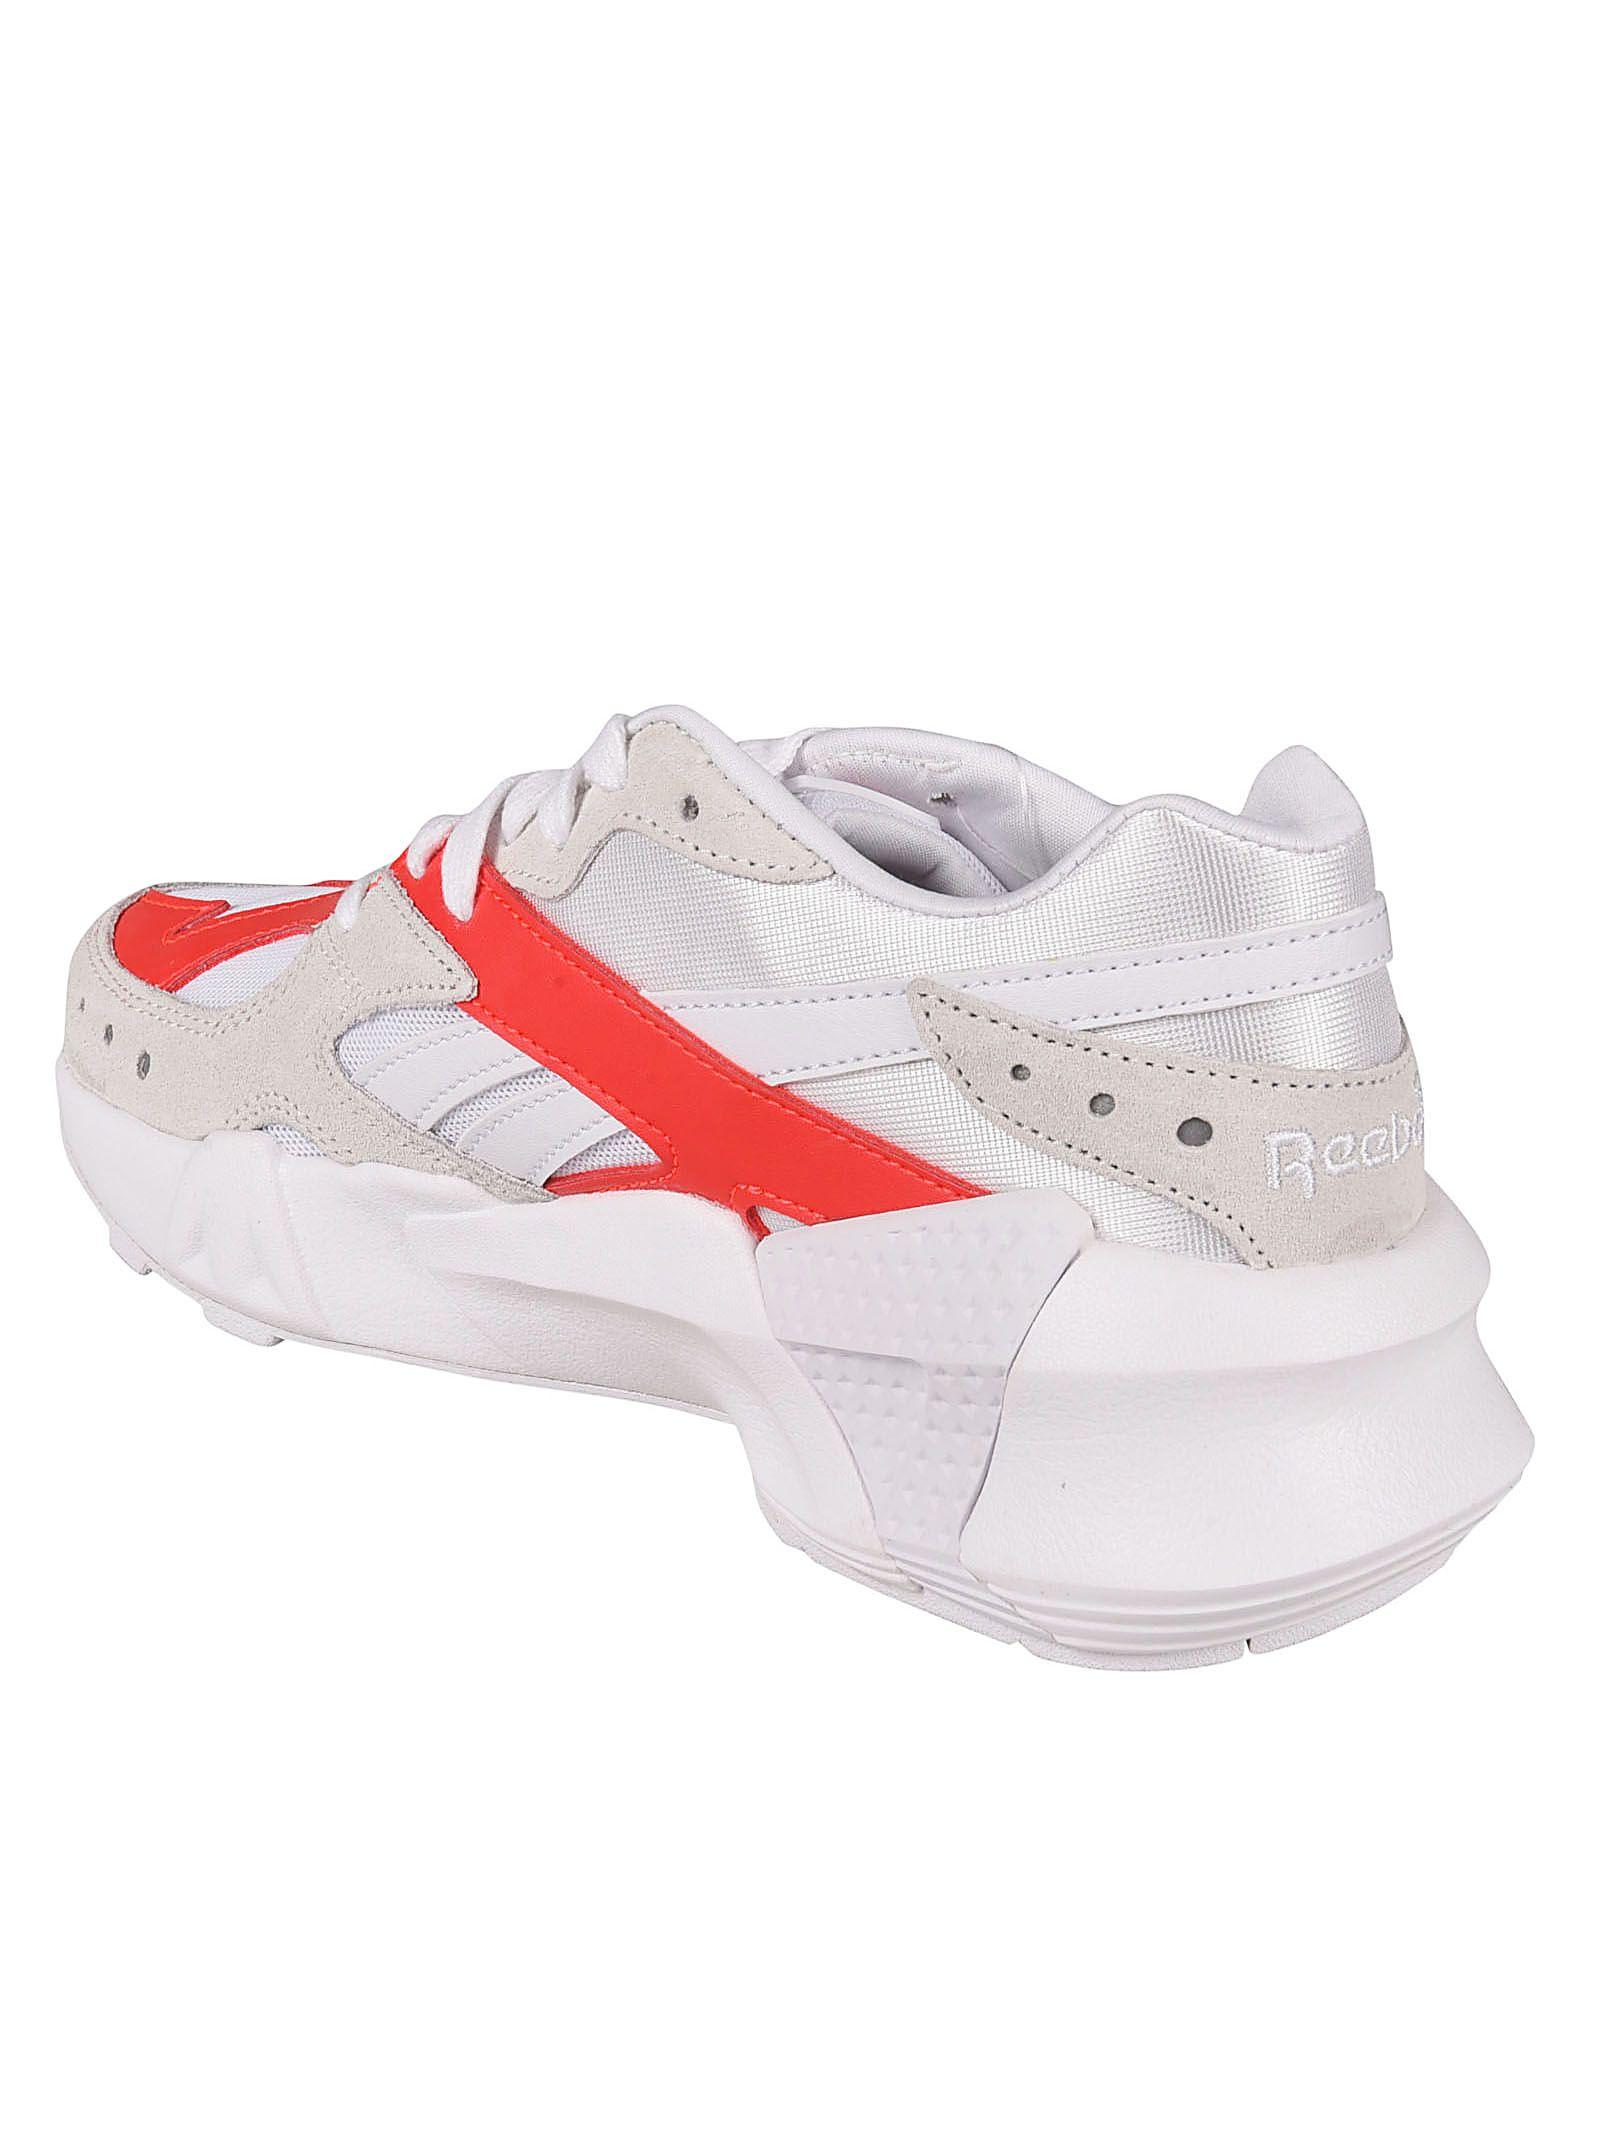 bb10b5e7d Reebok Reebok Aztrek Double X Gigi Hadid Sneakers - Multicolor ...